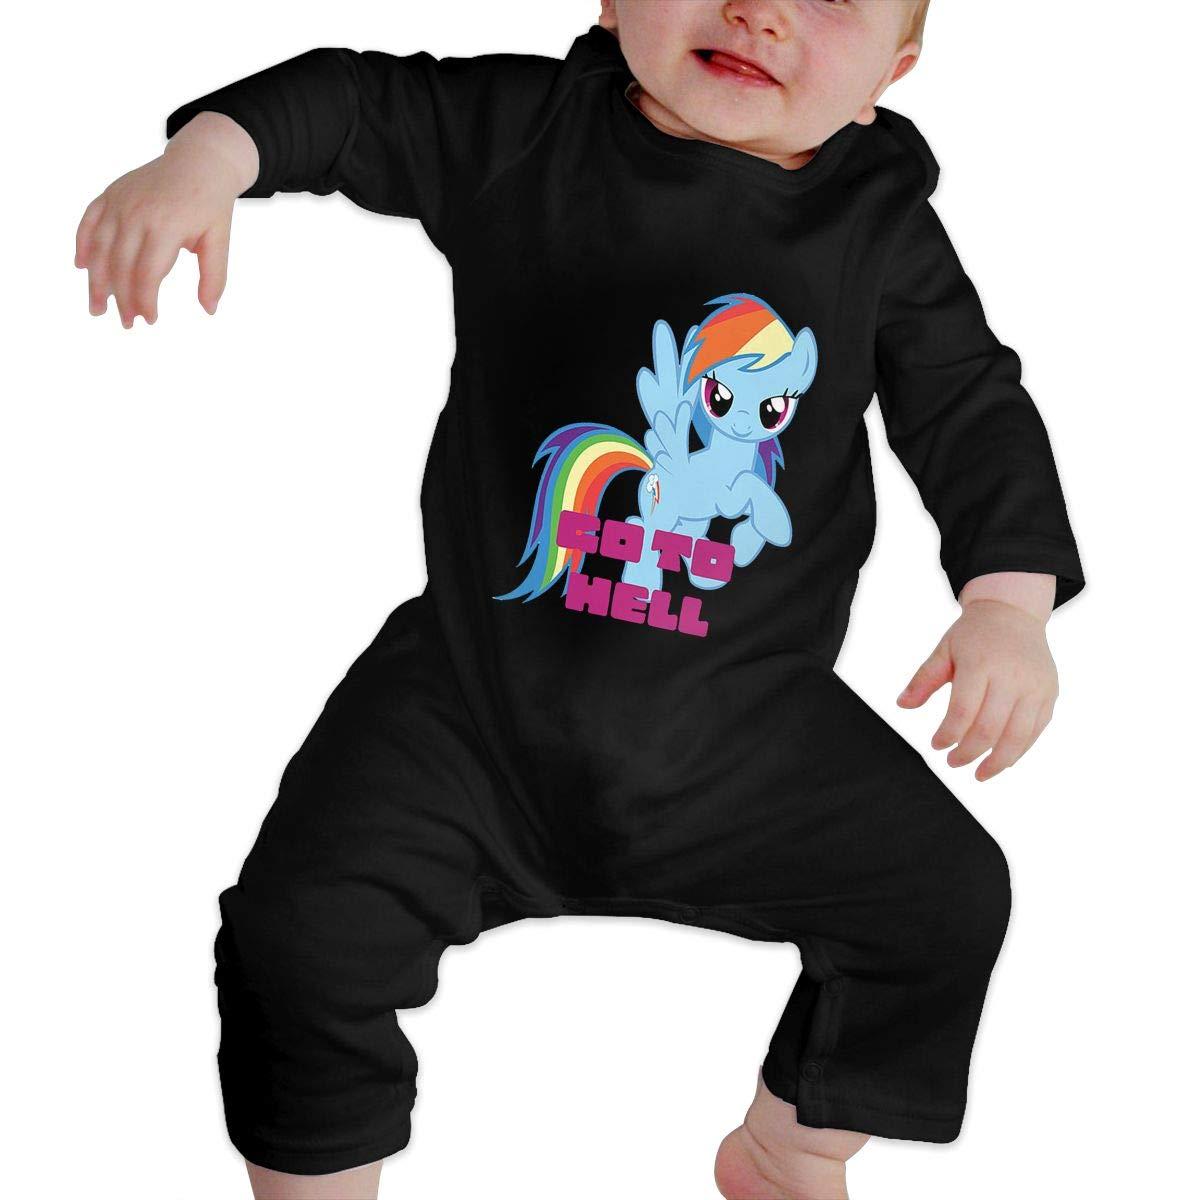 CharmKAT Unisex Baby Crew Neck Long Sleeve Solid Color Onesie Jumpsuit